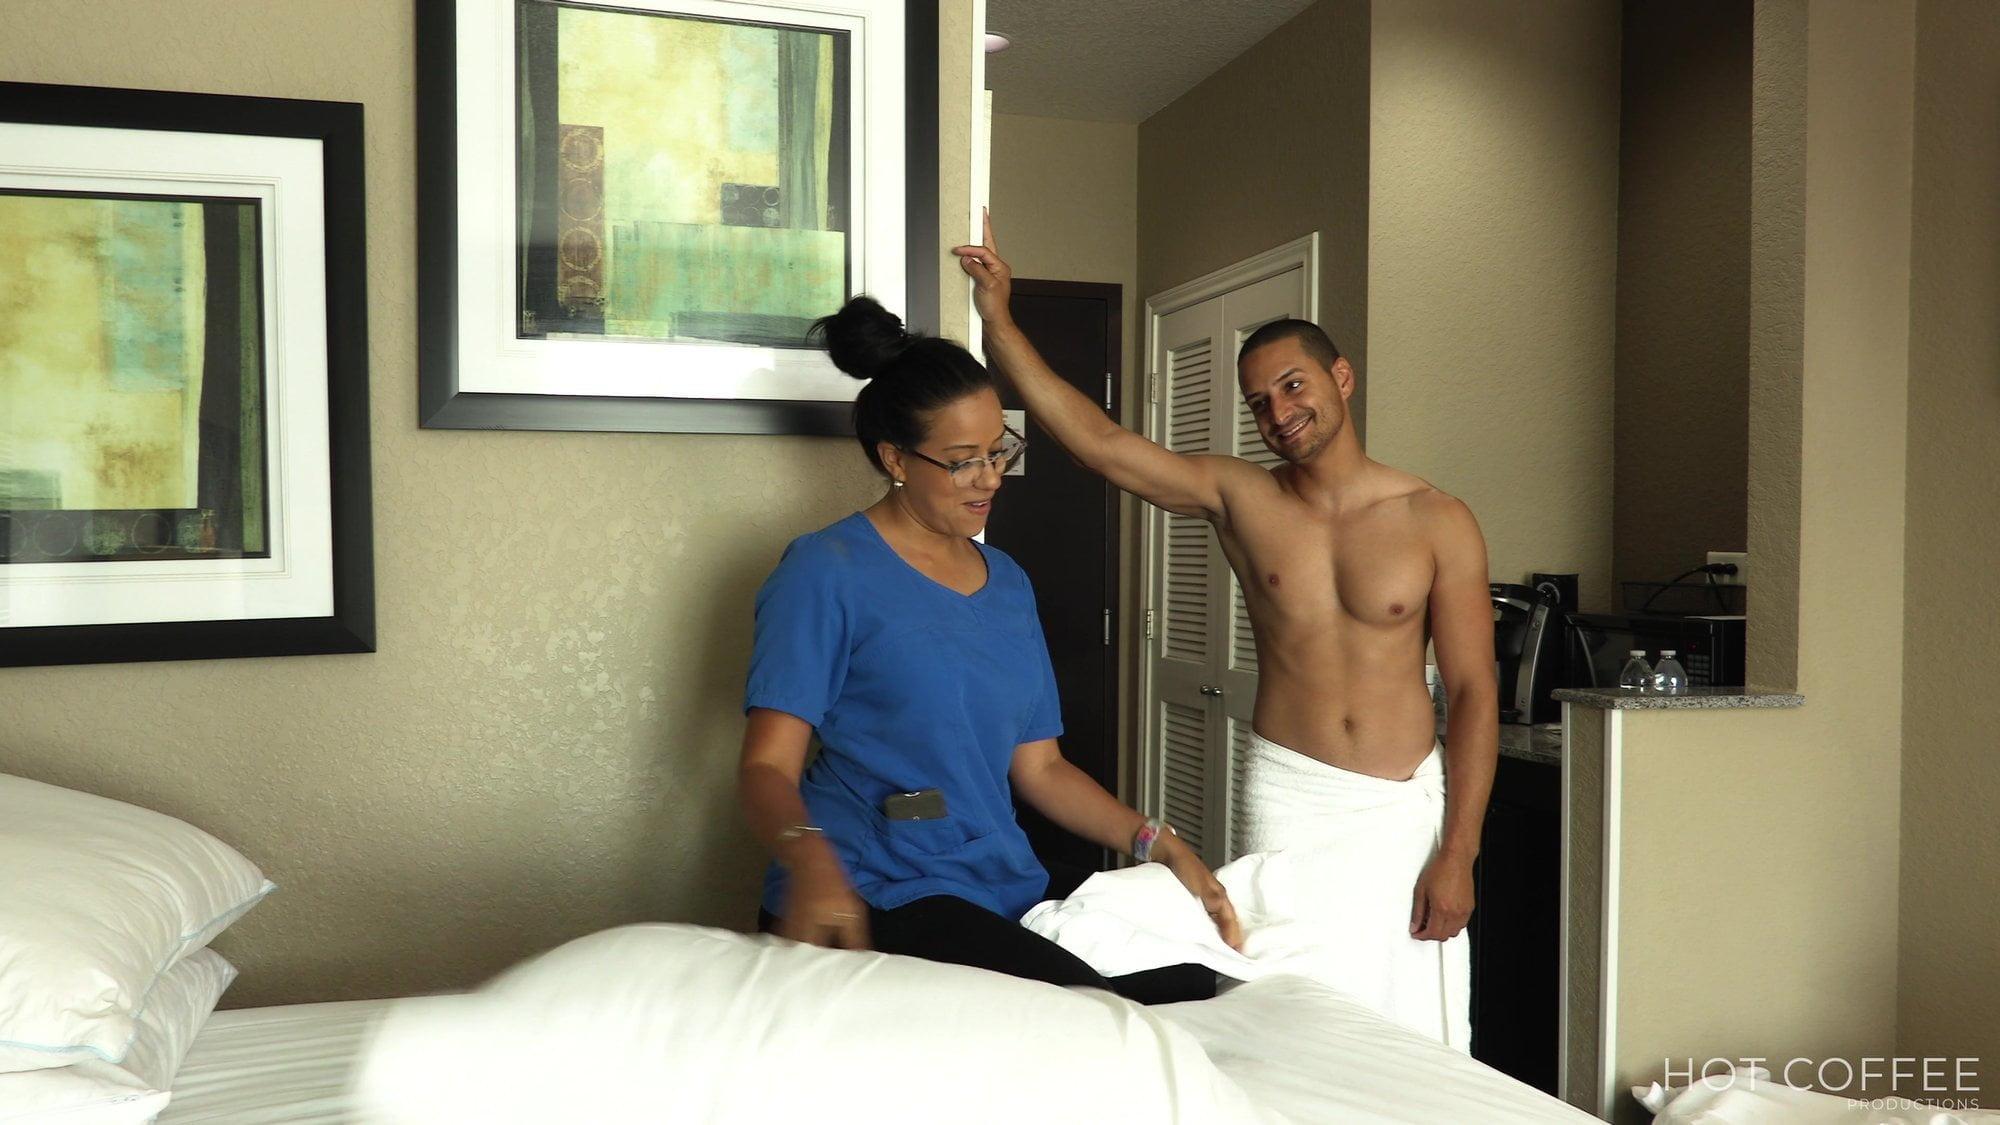 Son Mom Share Hotel Room